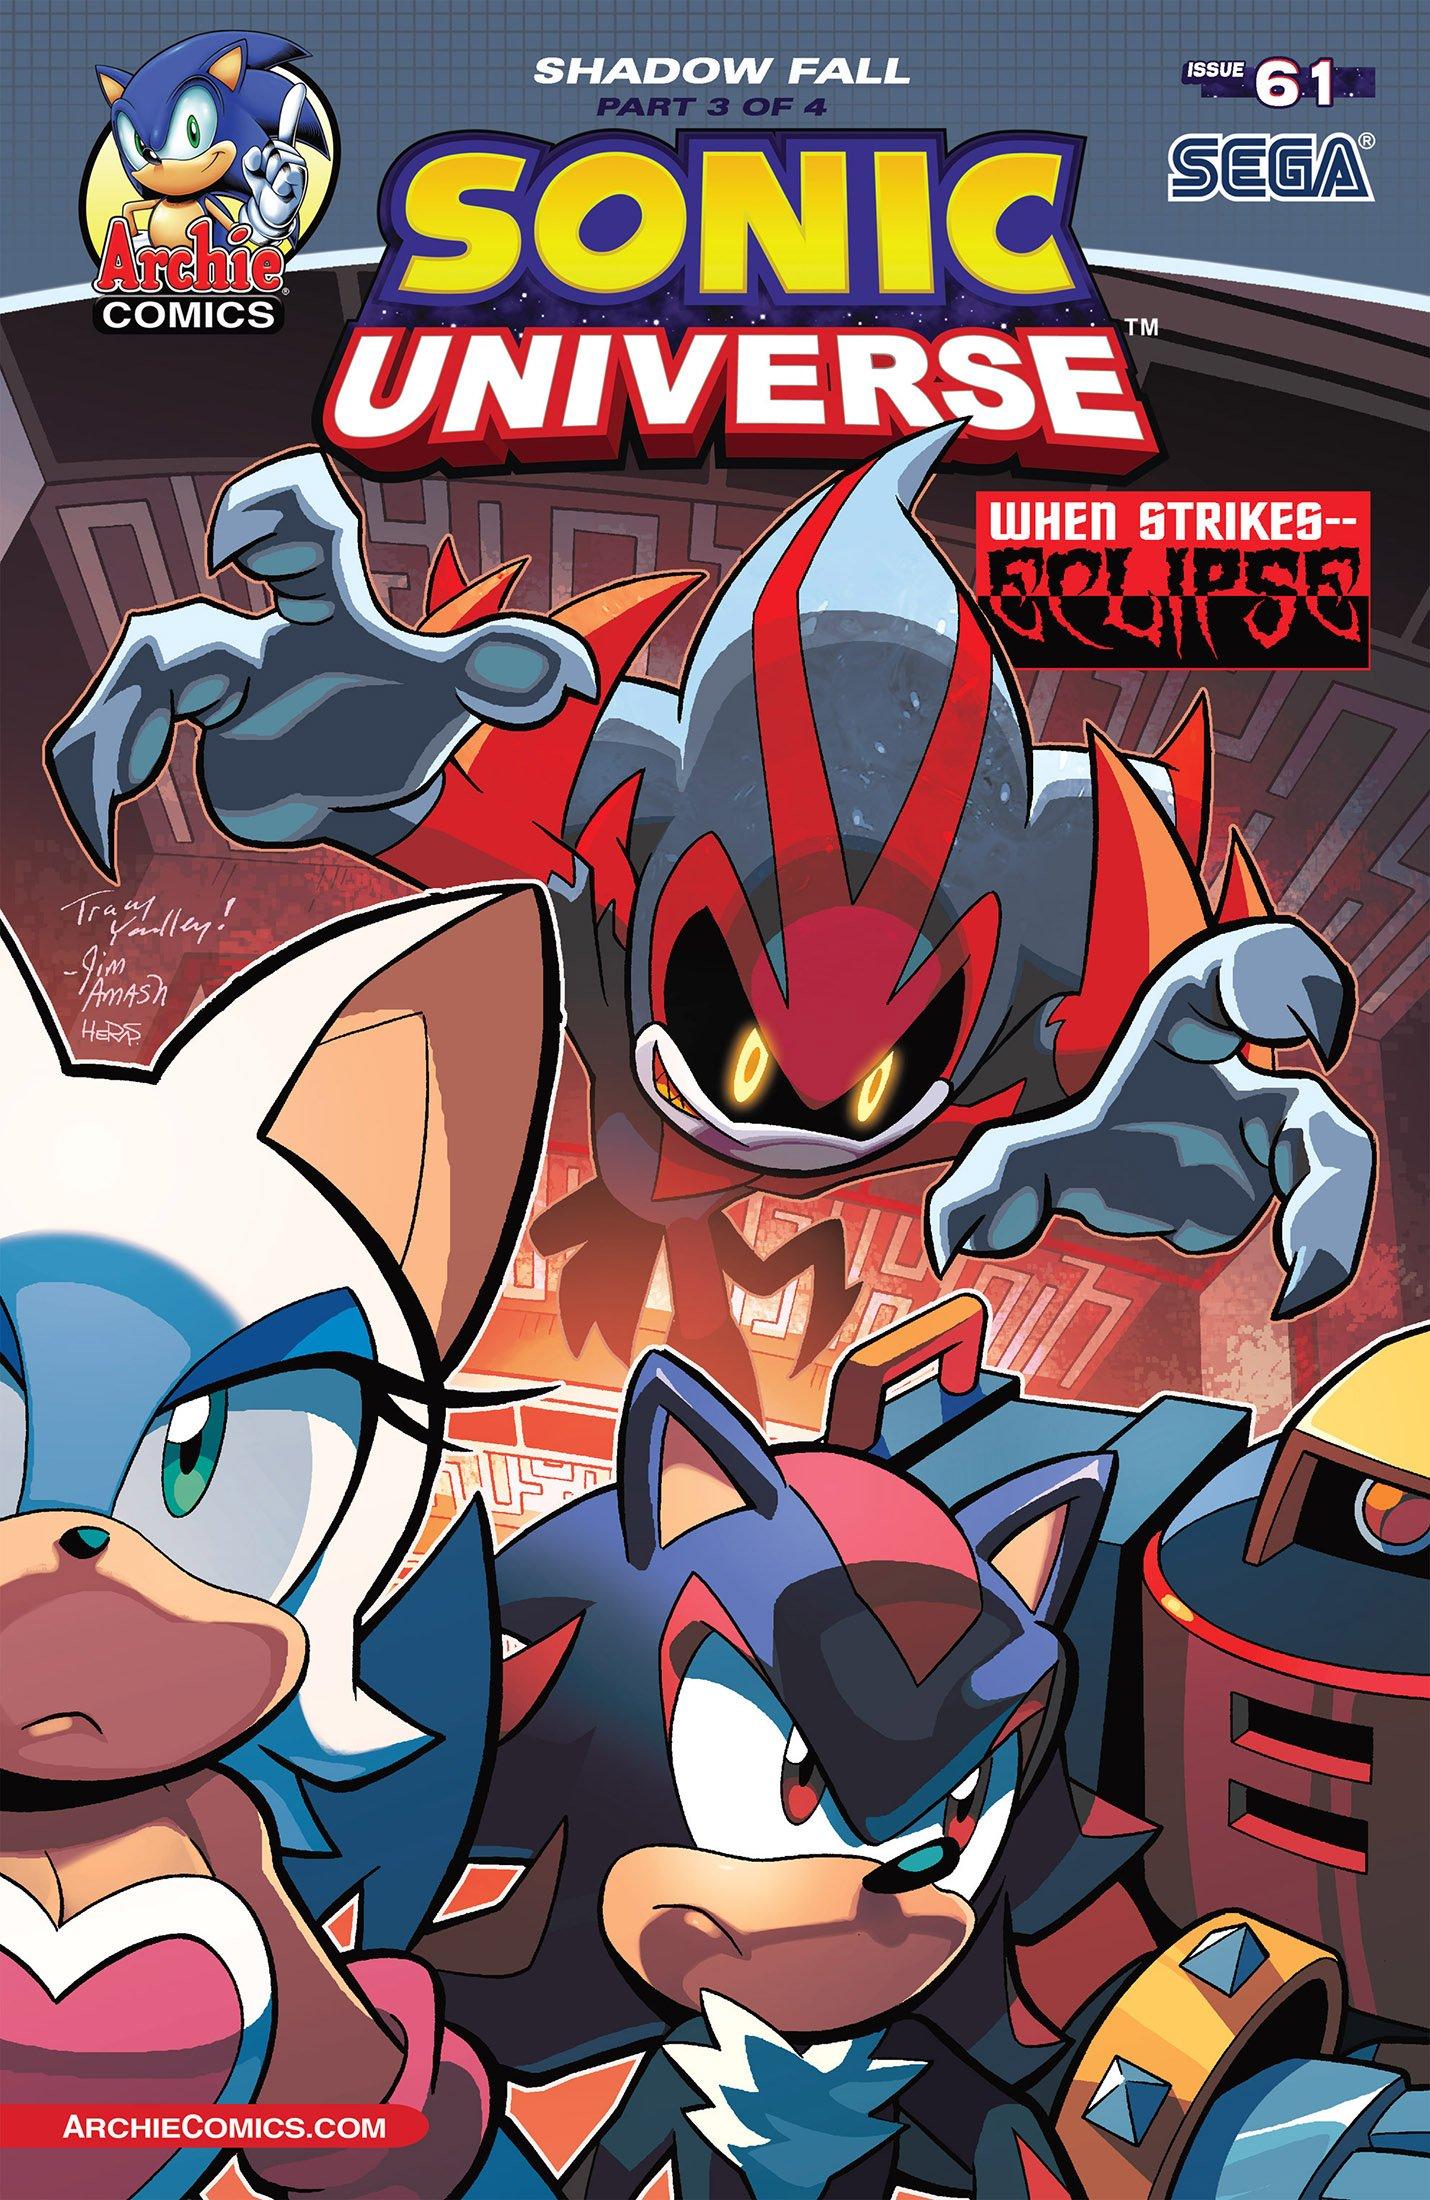 Sonic Universe 061 (April 2014)